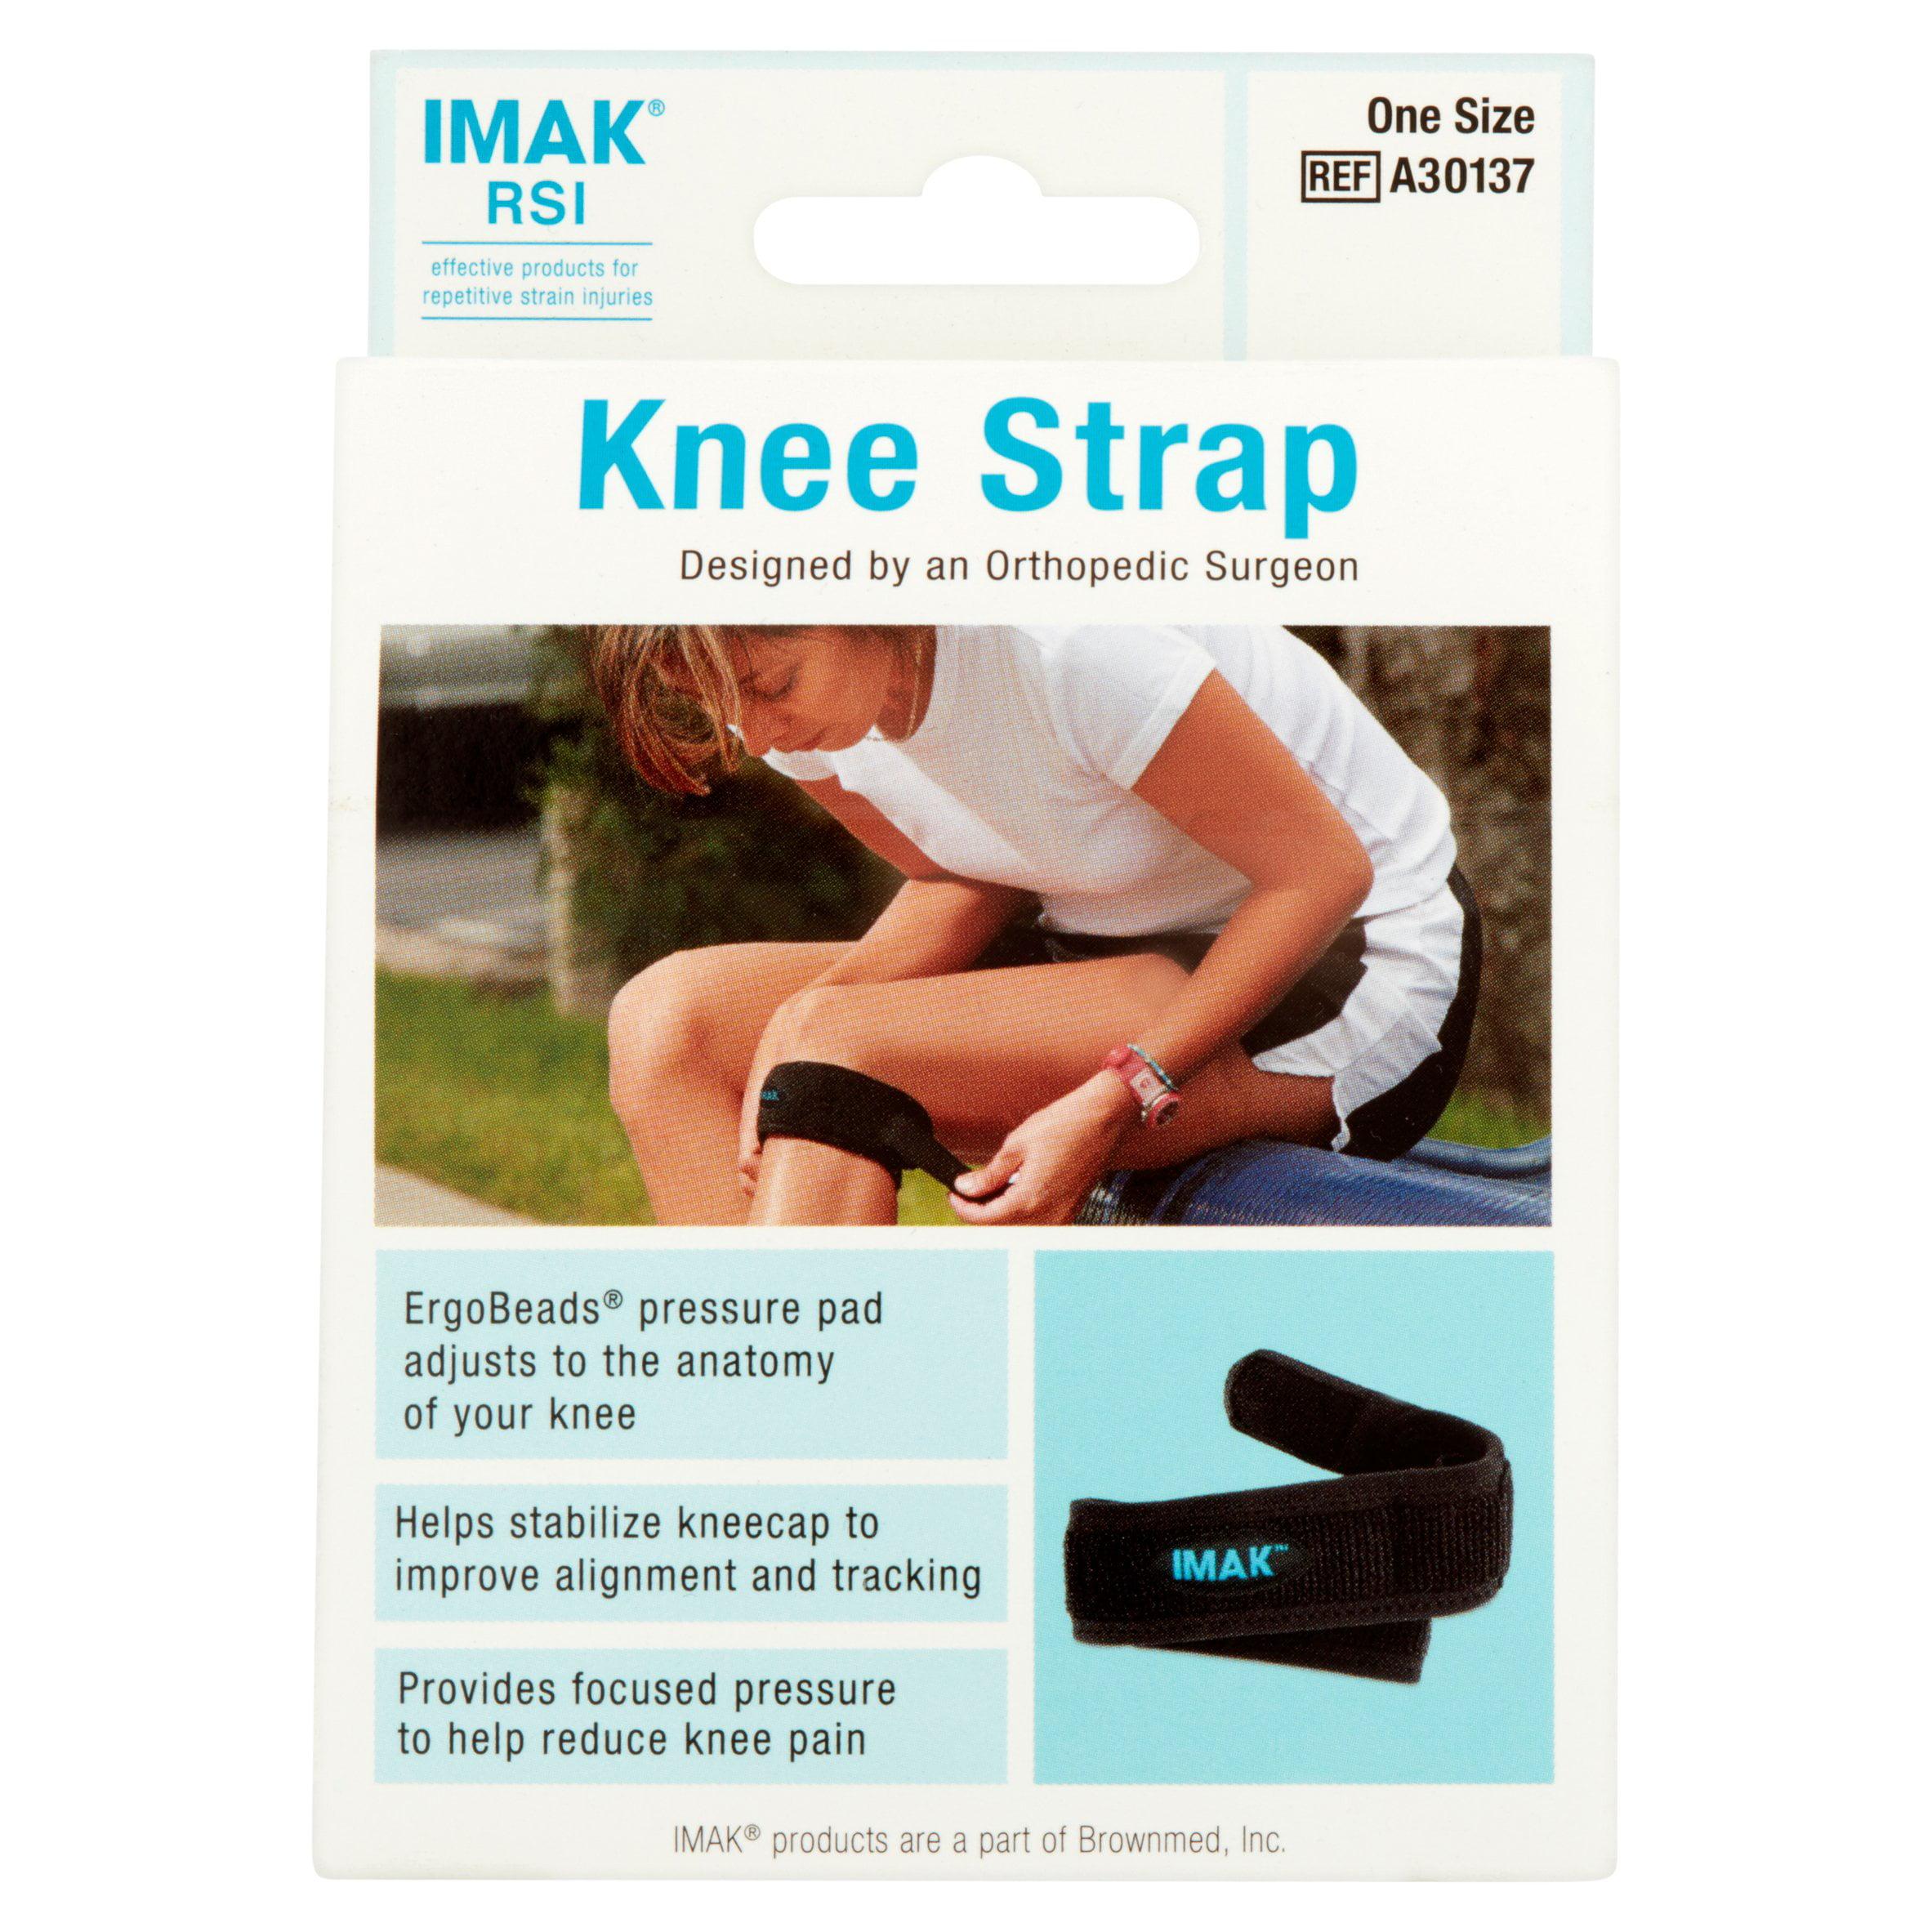 Imak RSI One Size Knee Strap